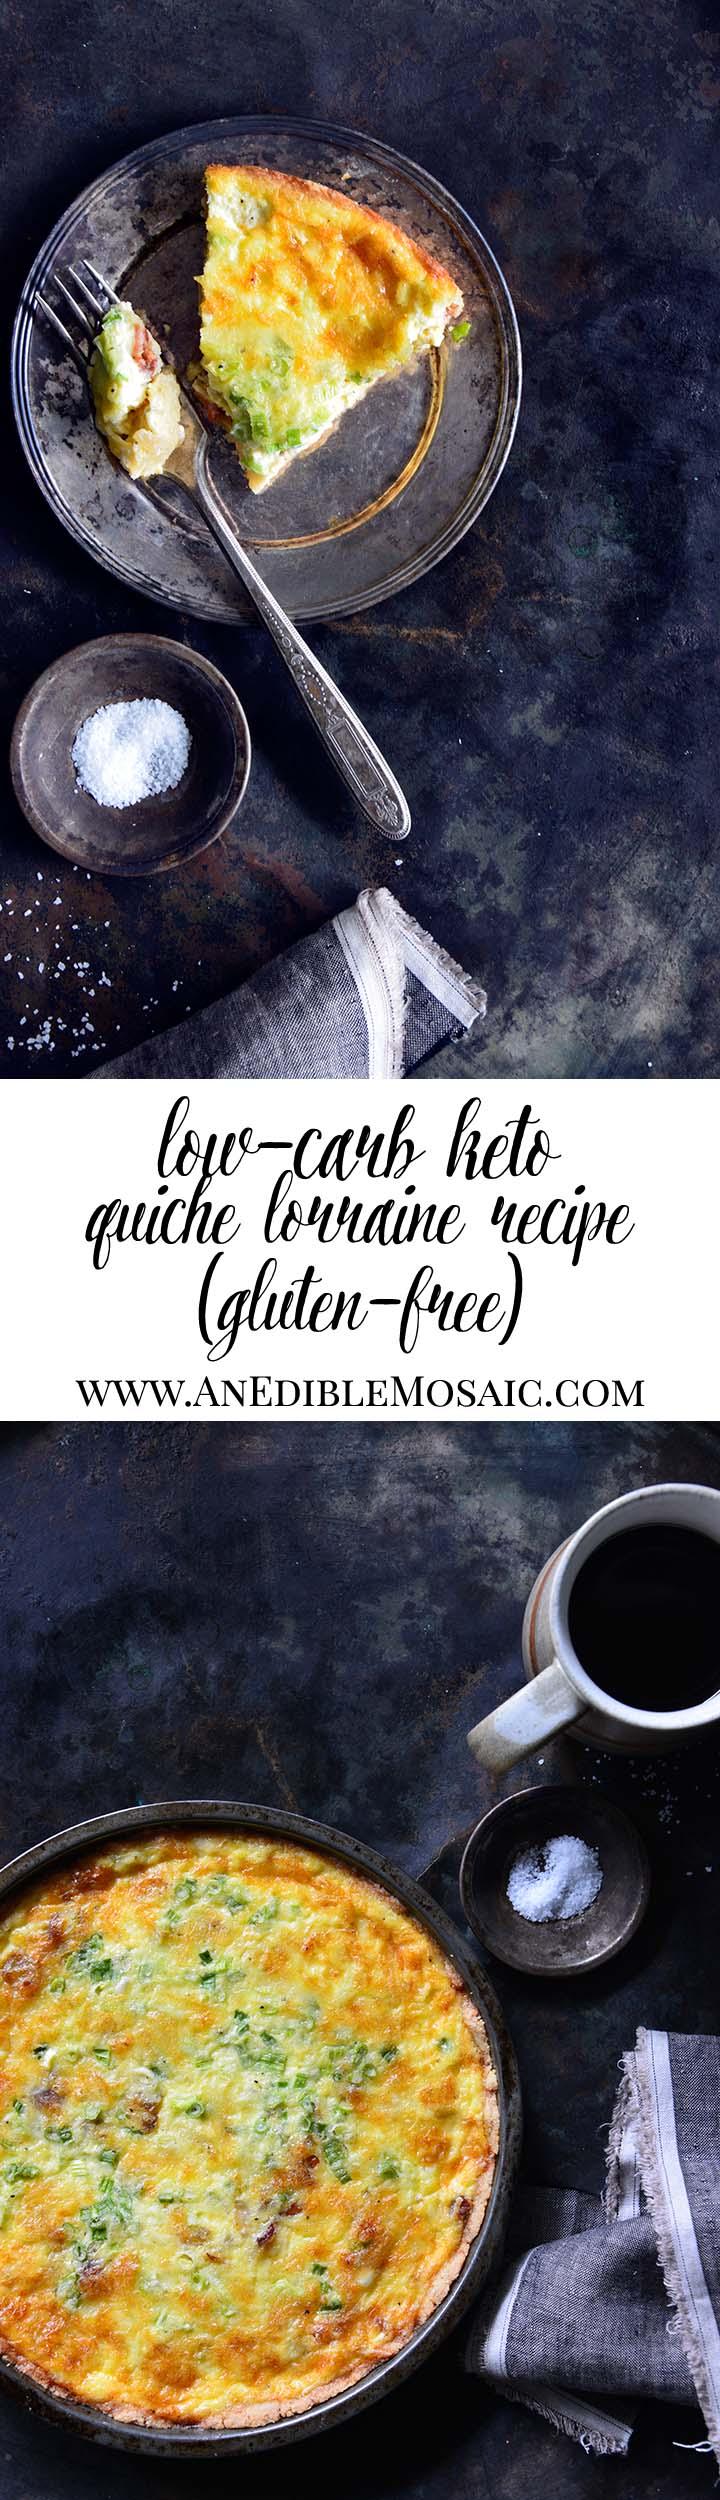 Low-Carb Keto Quiche Lorraine Long Pin